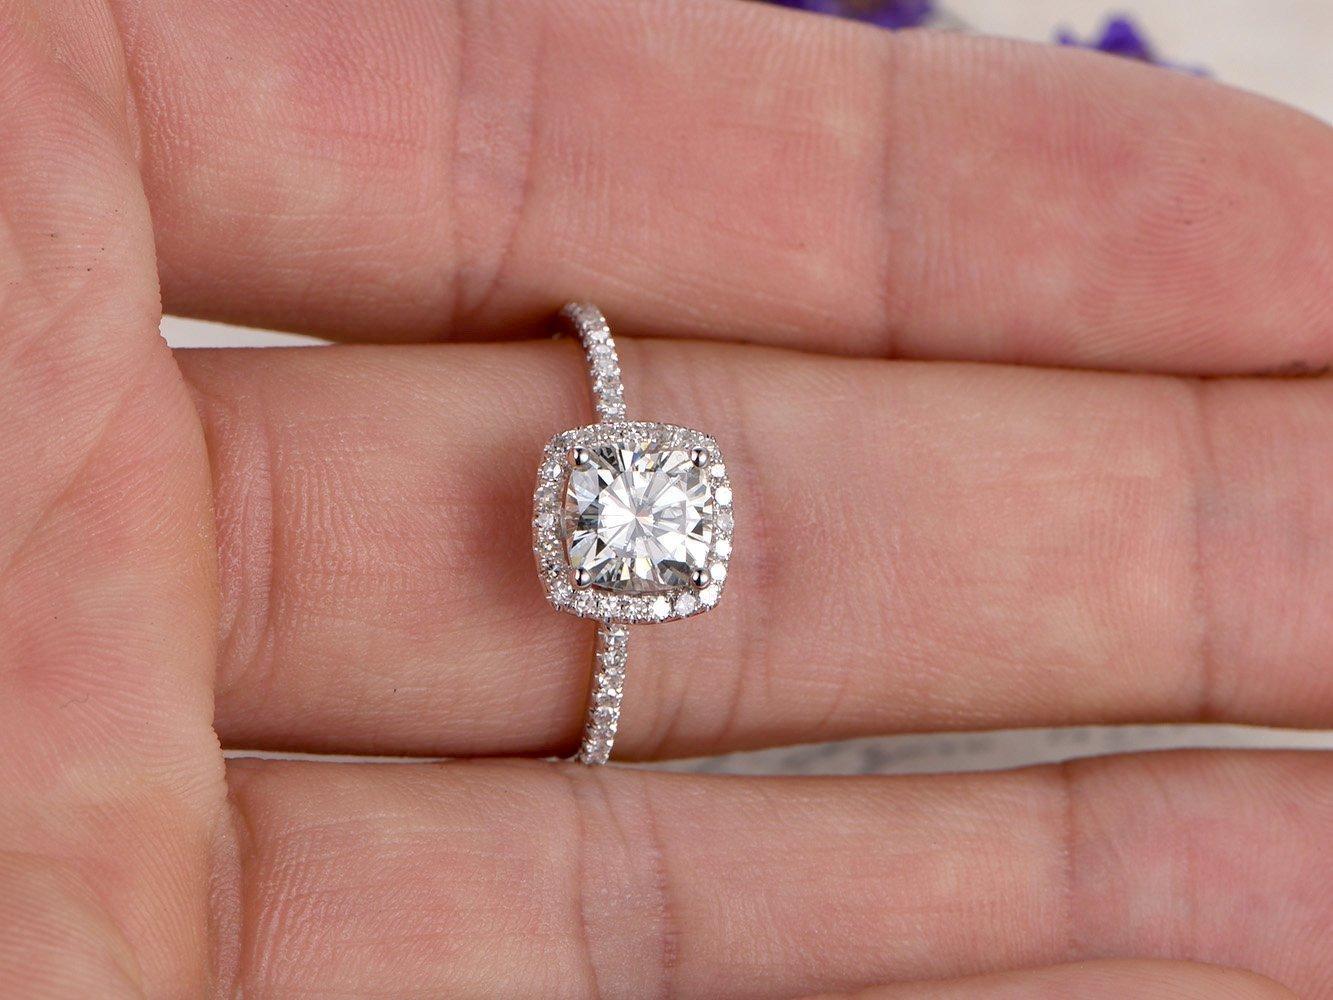 Amazon.com: Moissanite Engagement Ring Cushion Cut 7mm Gemstone SI ...